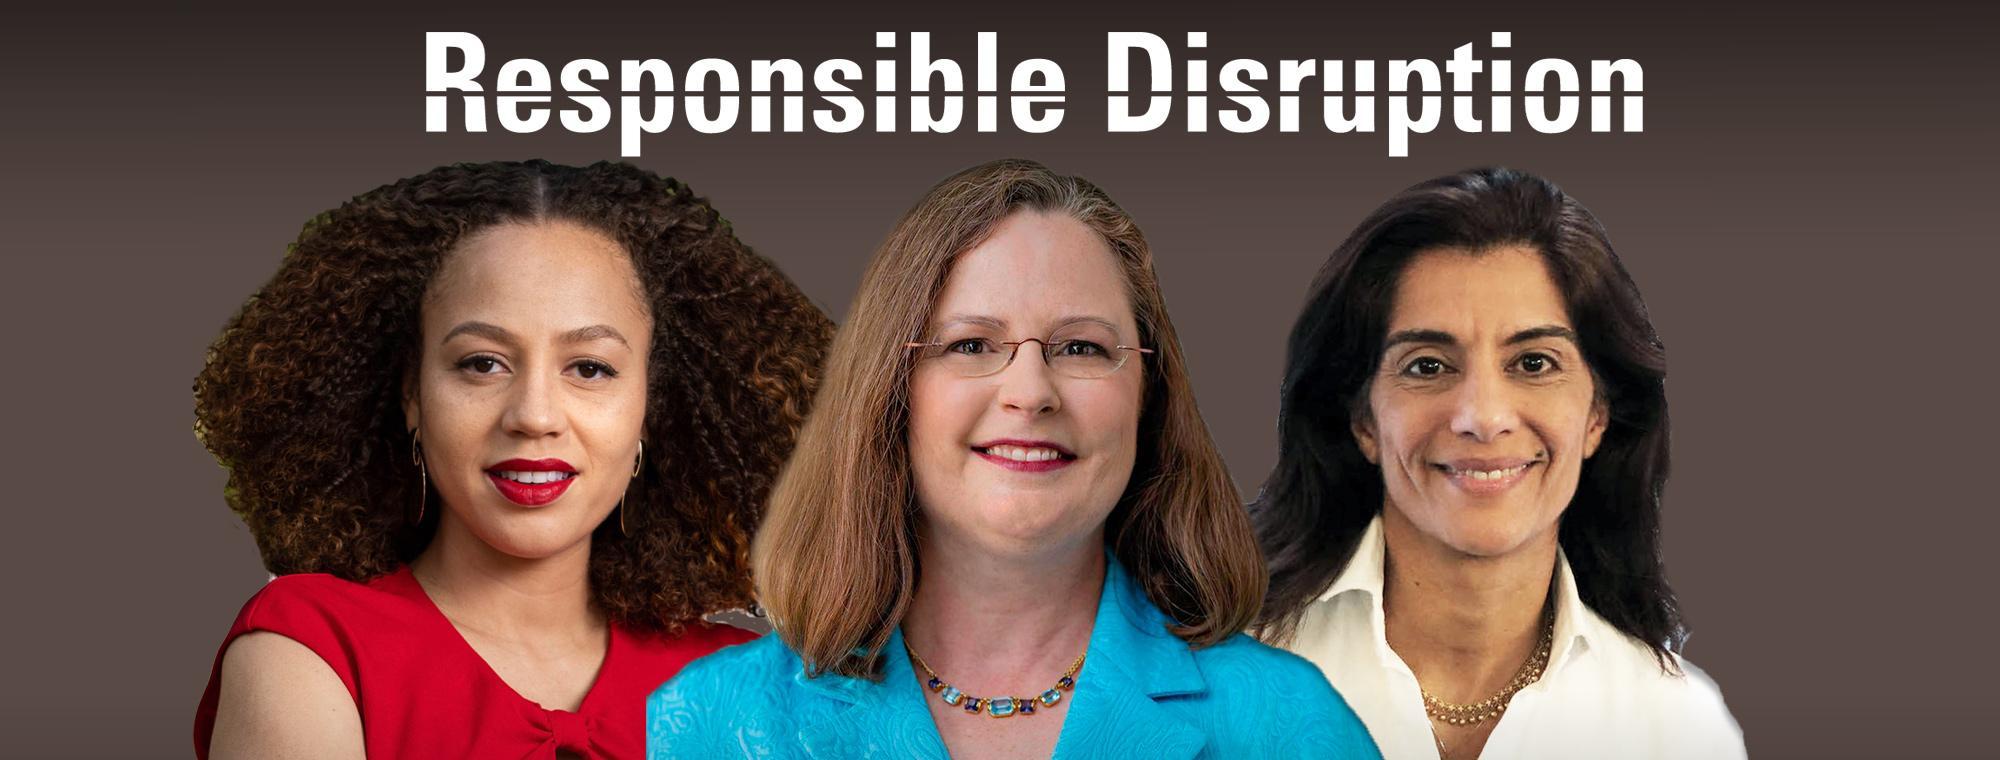 Responsible Disruption (3 speakers)